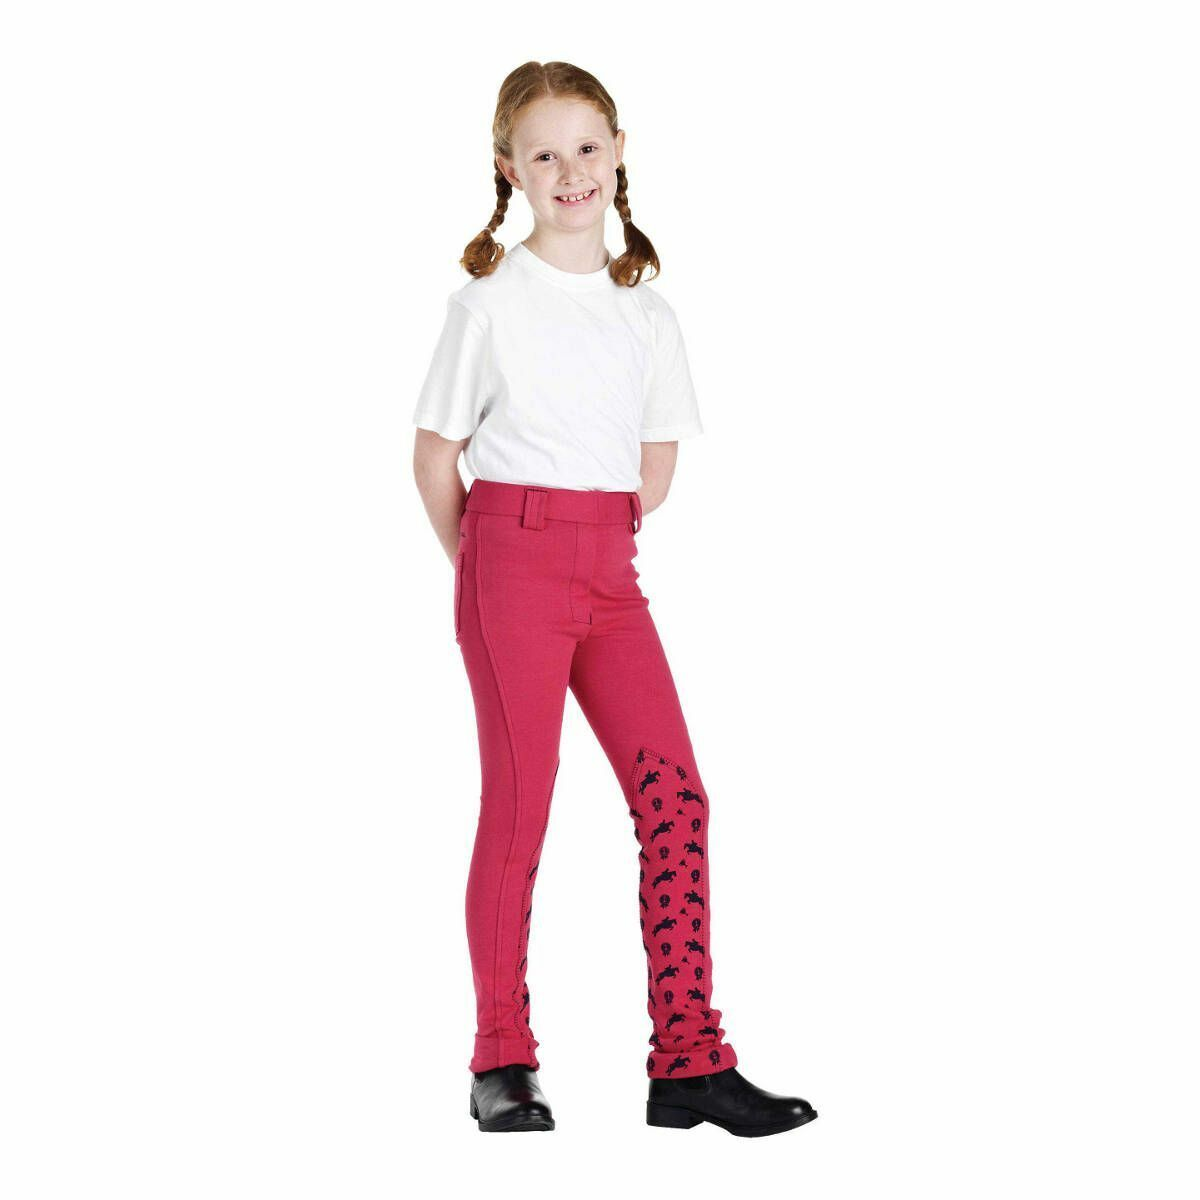 Harry Hall Winner kids Junior Jodhpurs Pink Pony Print Jodhpurs 26  Long 9-10Yrs